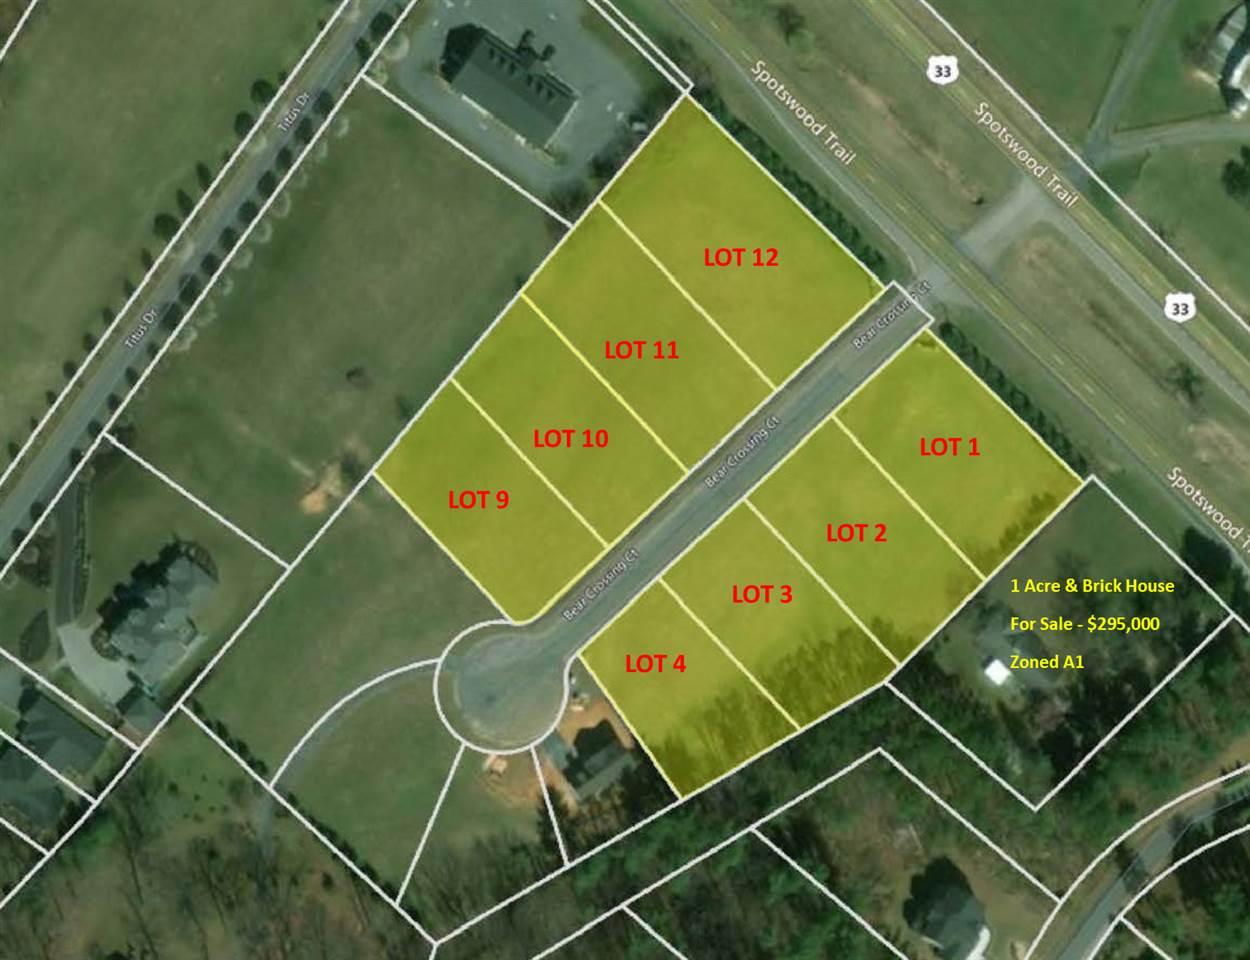 Lot 3 BEAR CROSSING CT, PENN LAIRD, VA 22846